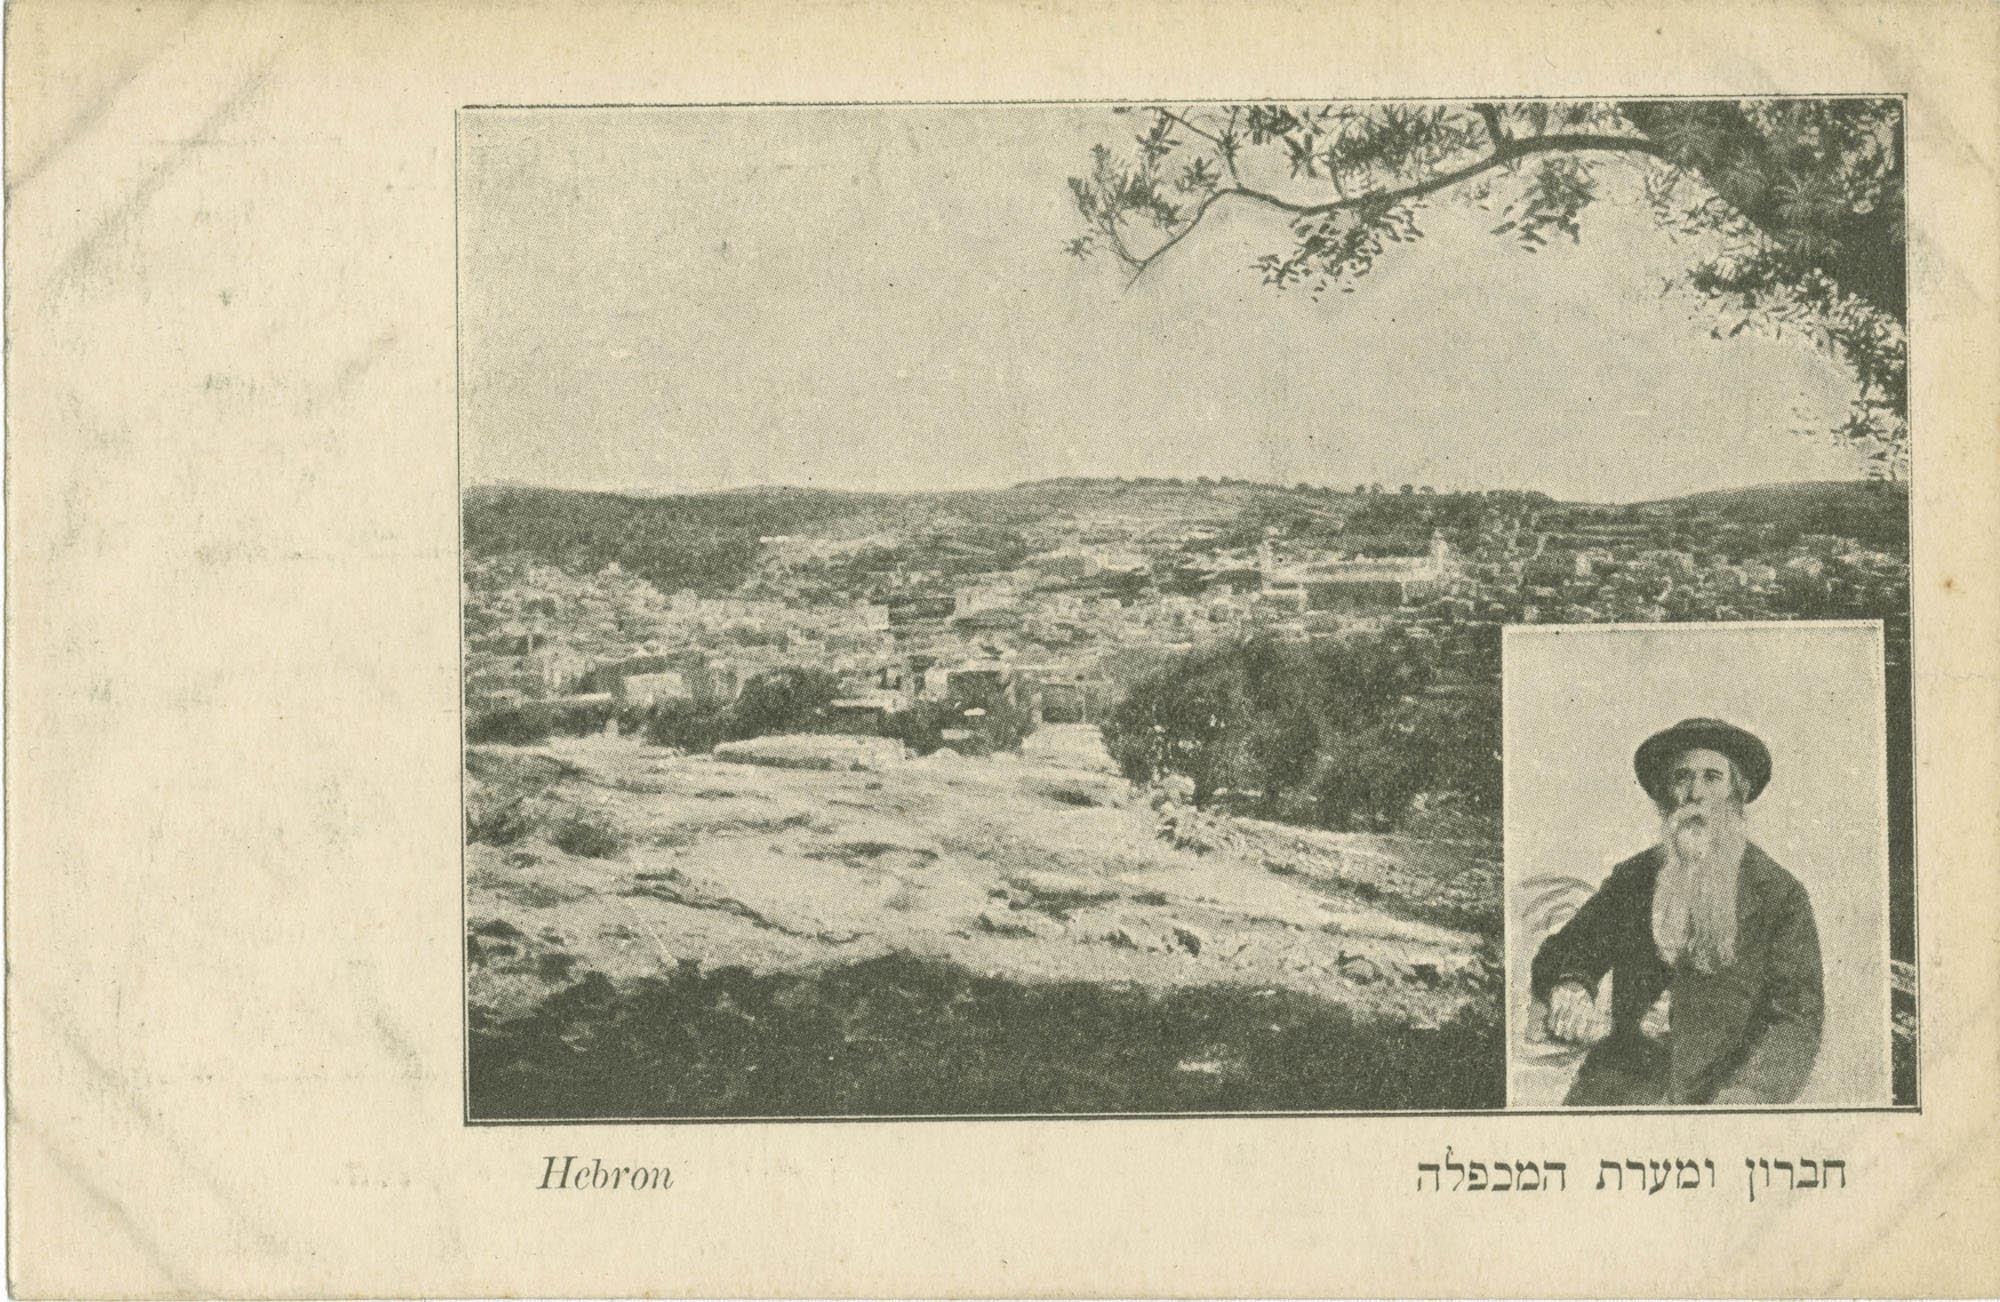 Hebron / חברון ומערת המכפלה